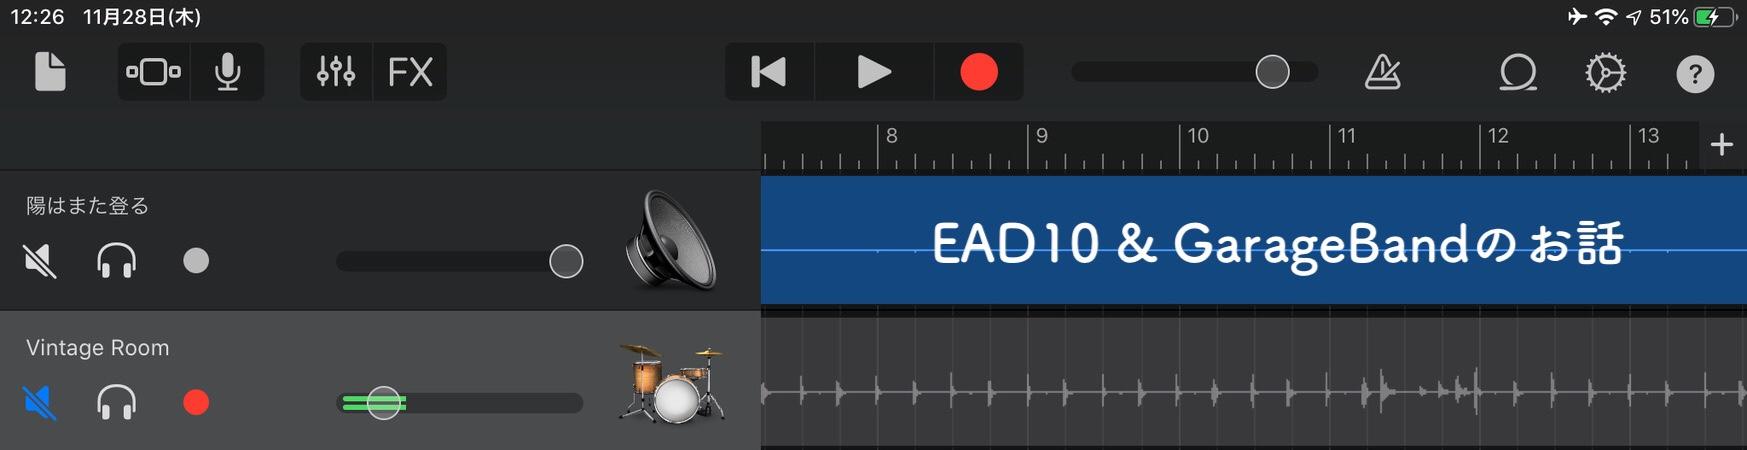 EAD10、フットスイッチでトークバックのオン・オフの切り替えを設定。